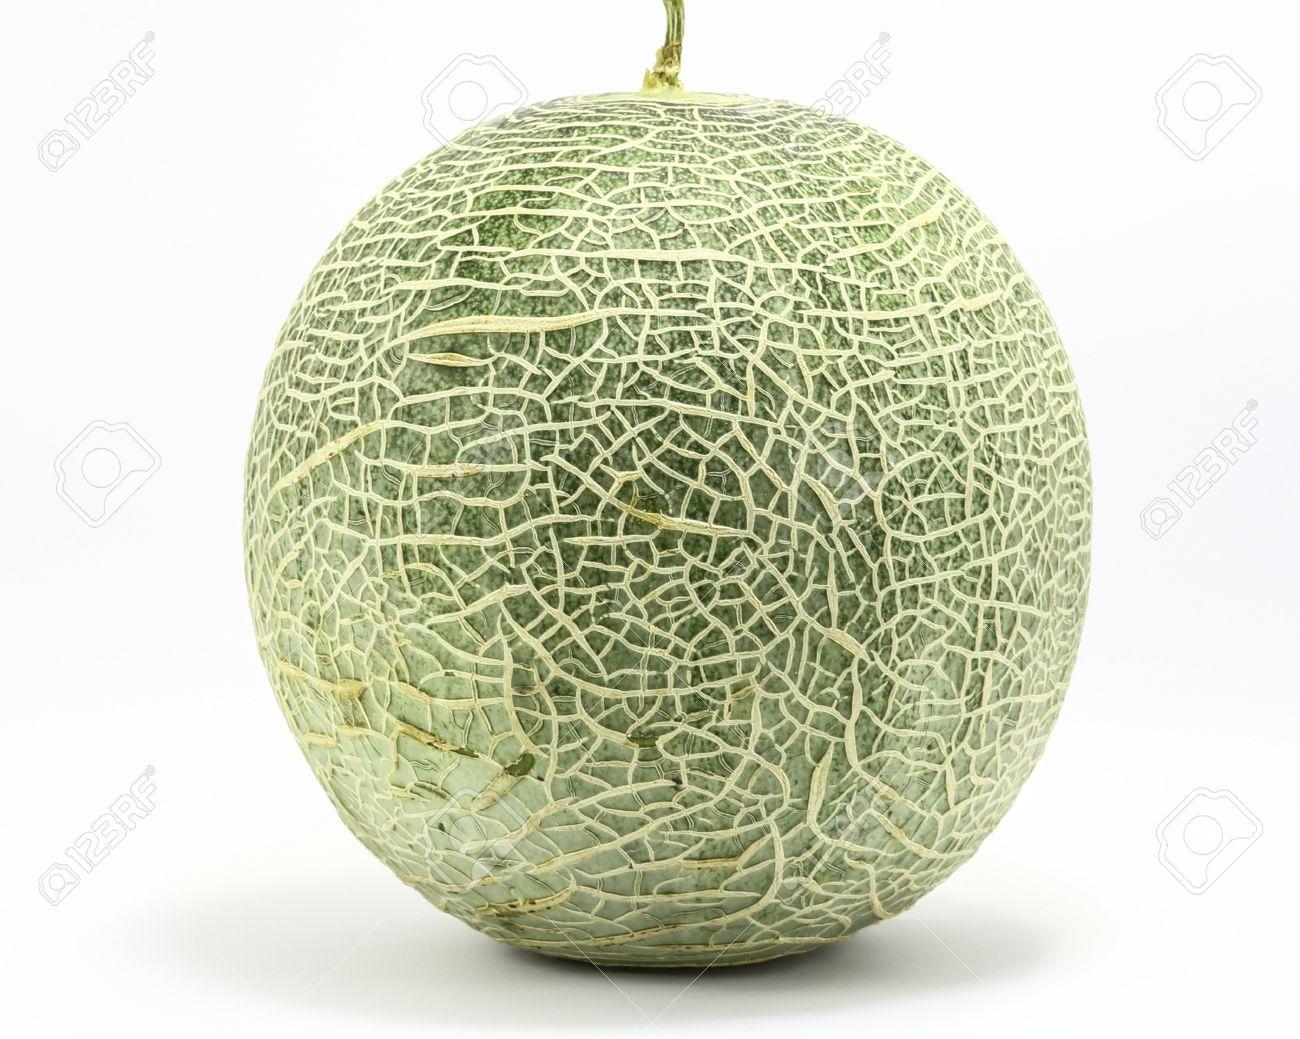 cantaloupe rock melon green cantelope cantaloupe muskmelon mushmelon